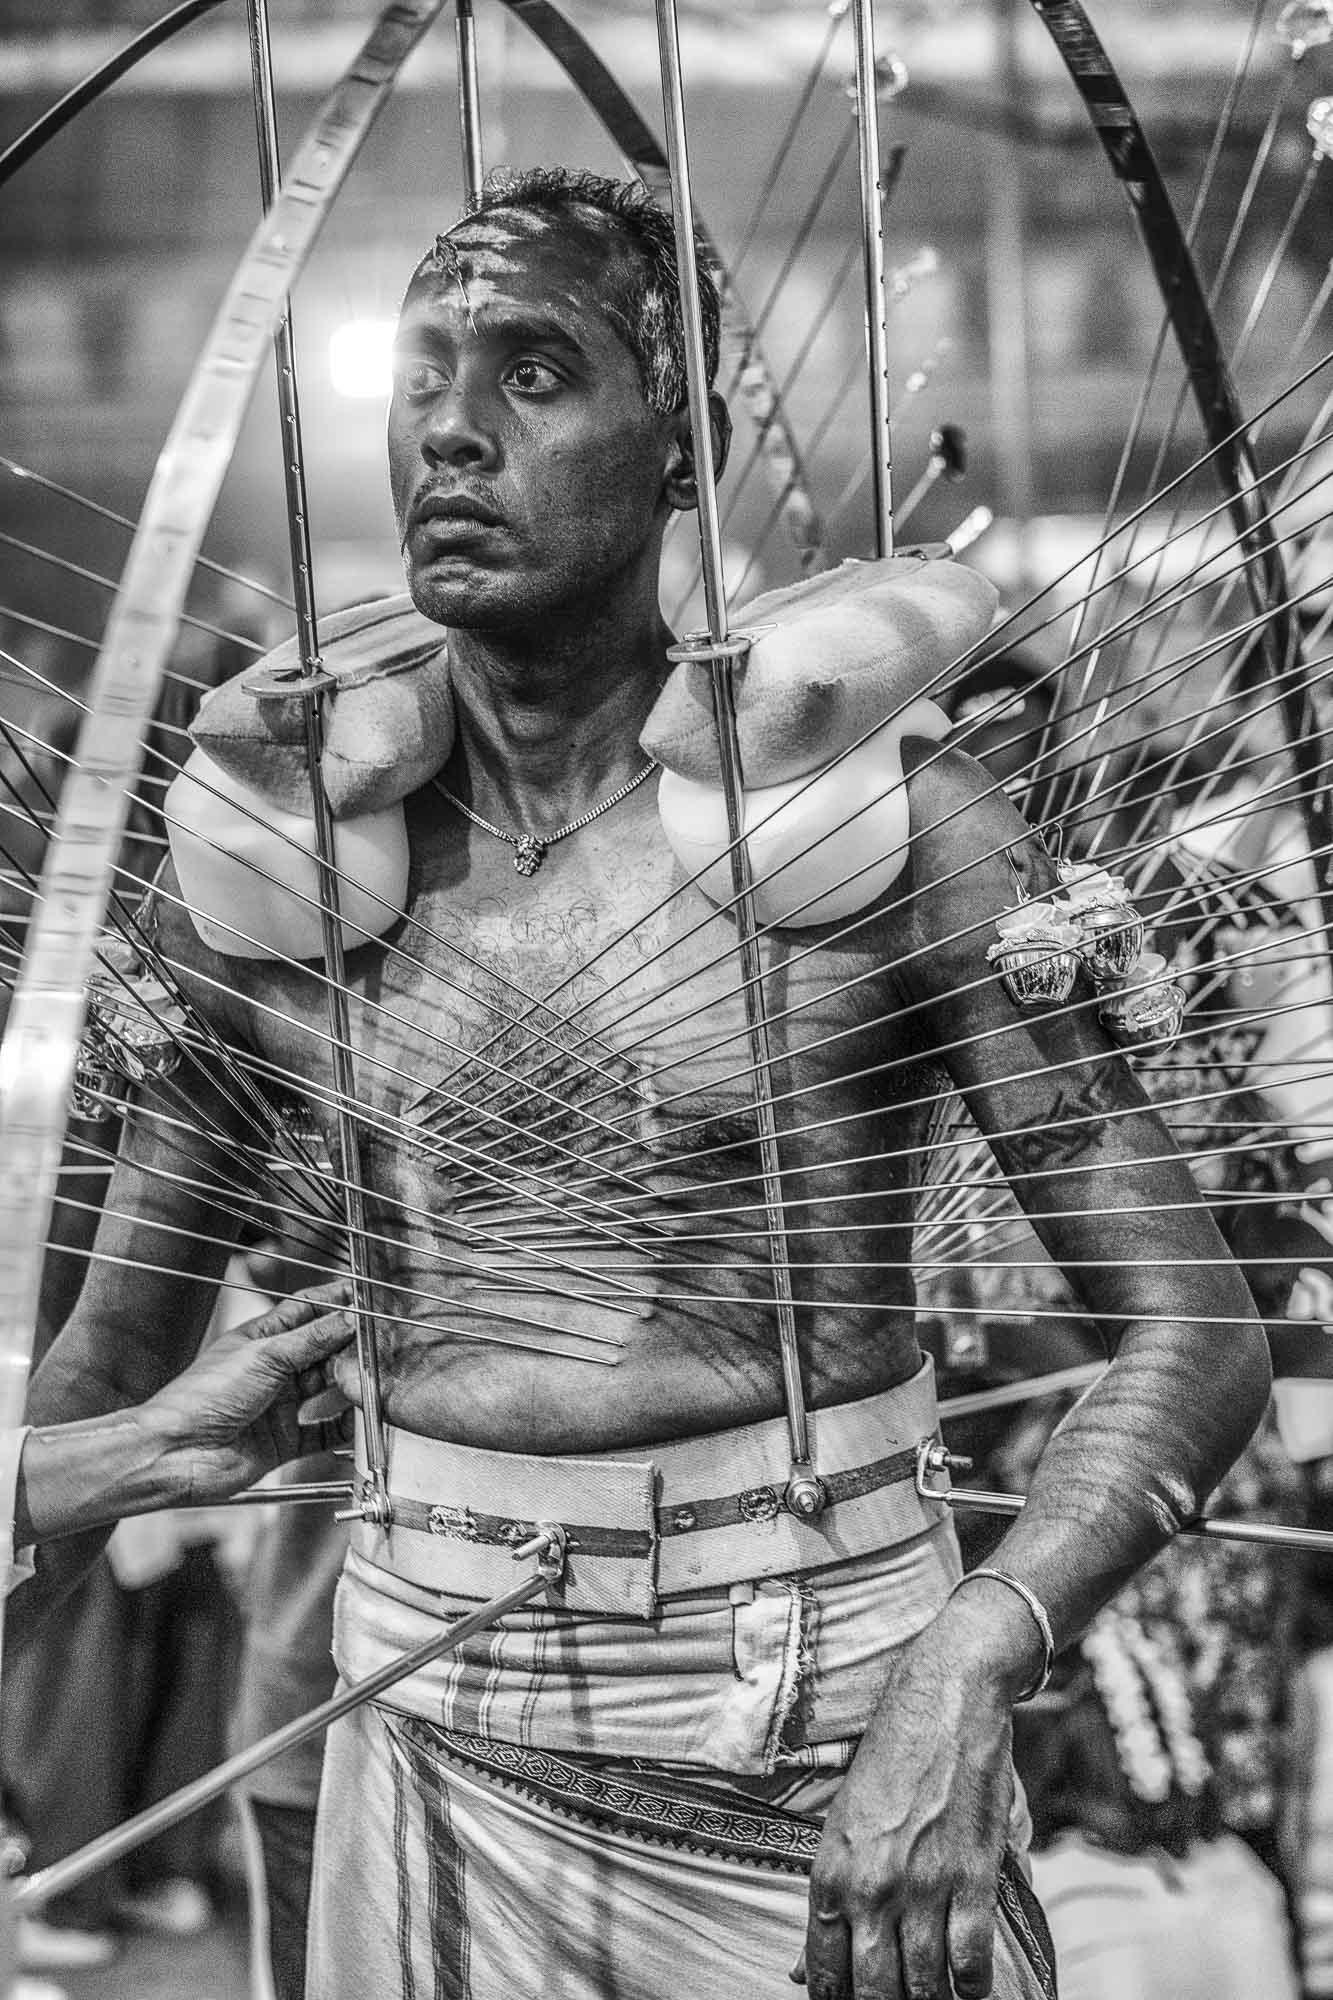 piercing body man temple char Little India Thaipusam Festival hindu Singapore photography jose jeuland documentary event